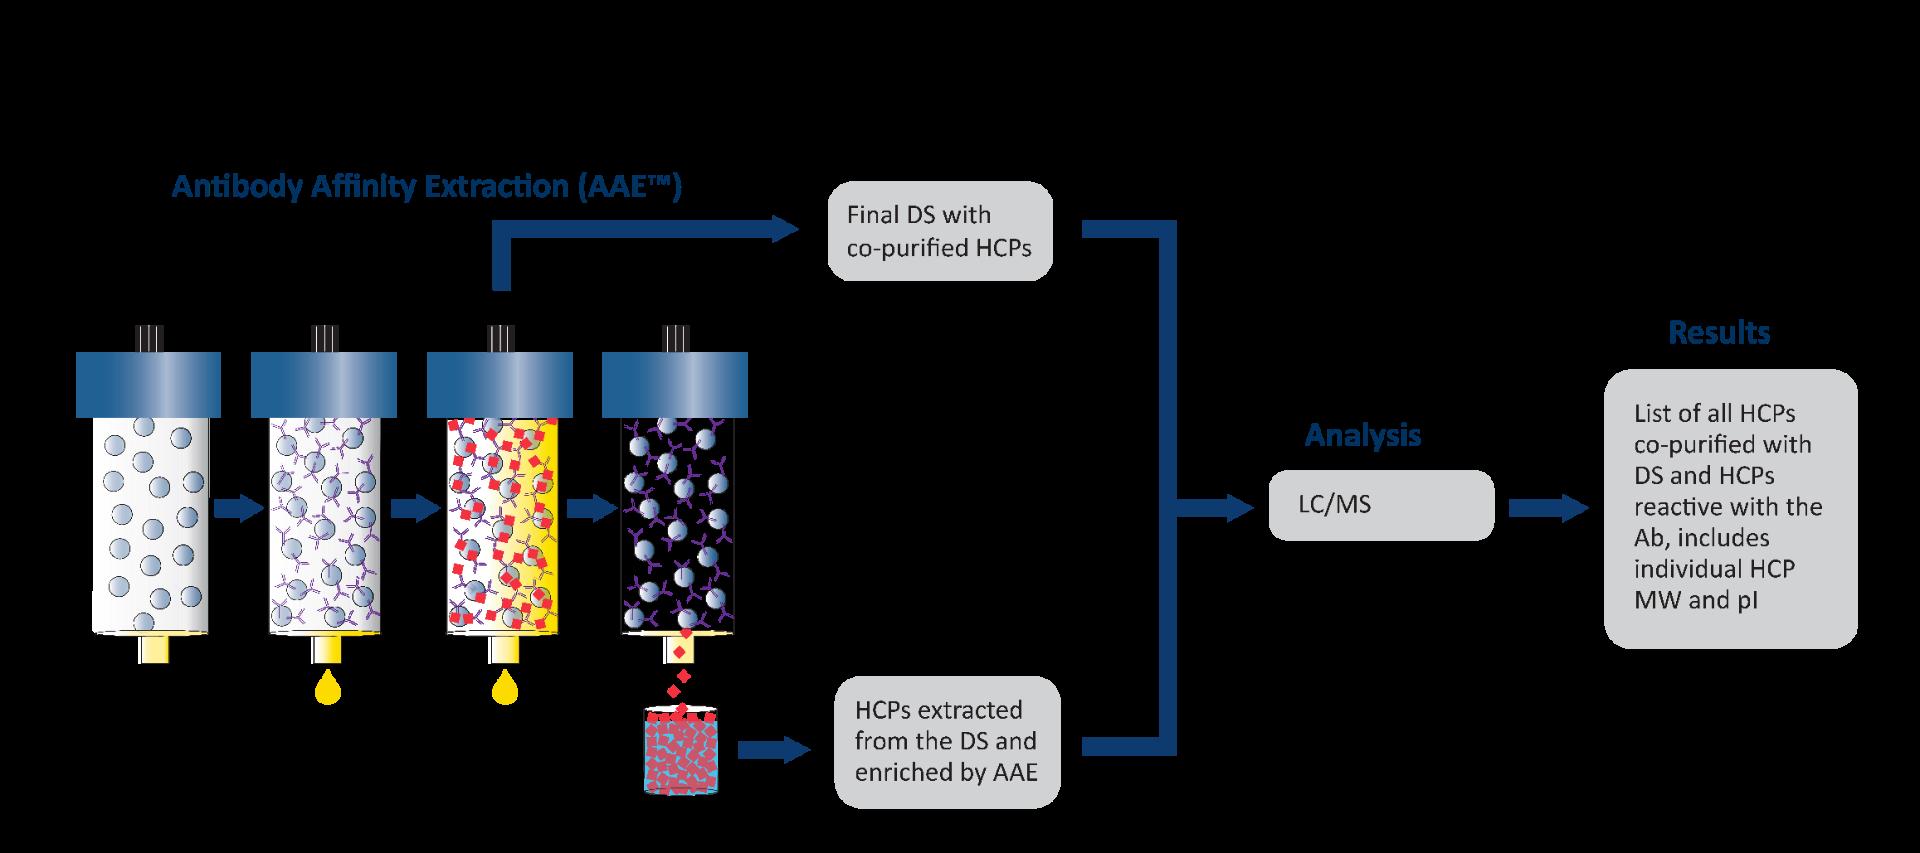 Antibody-Affinity-Extraction_AAE__11-20-02_002_